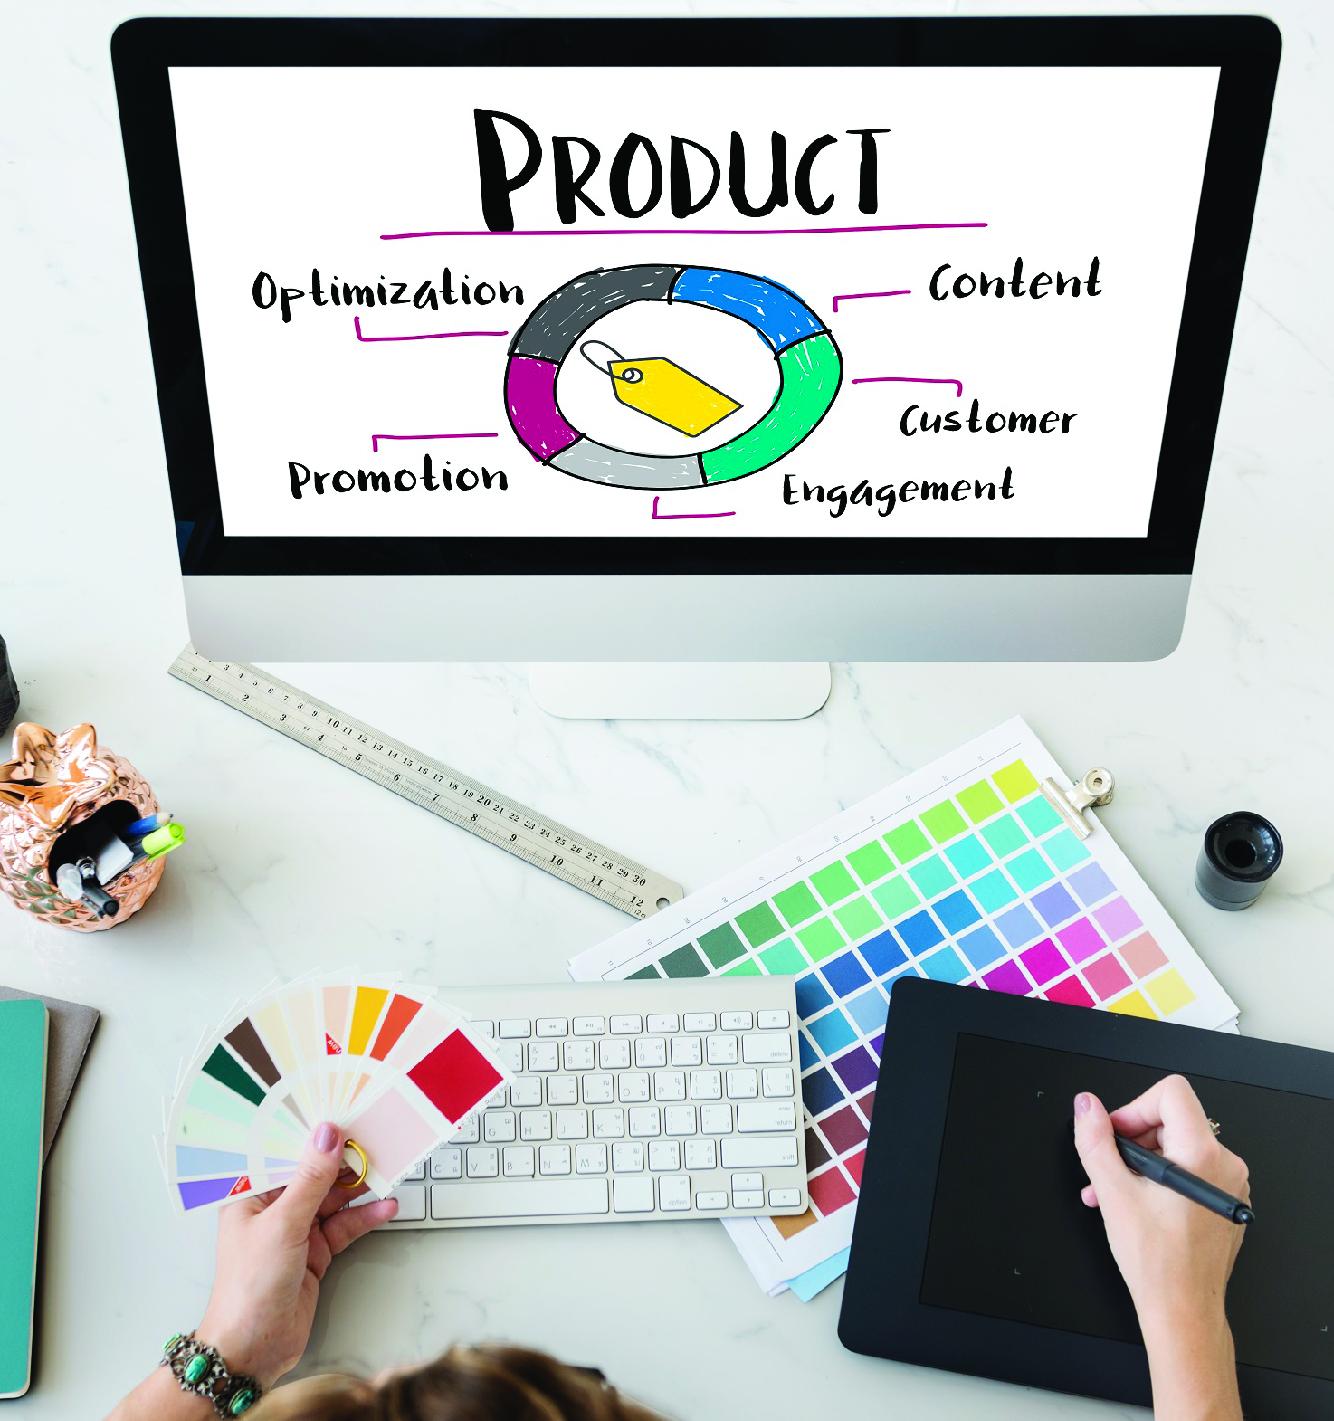 Digital marketing planning at Help Square